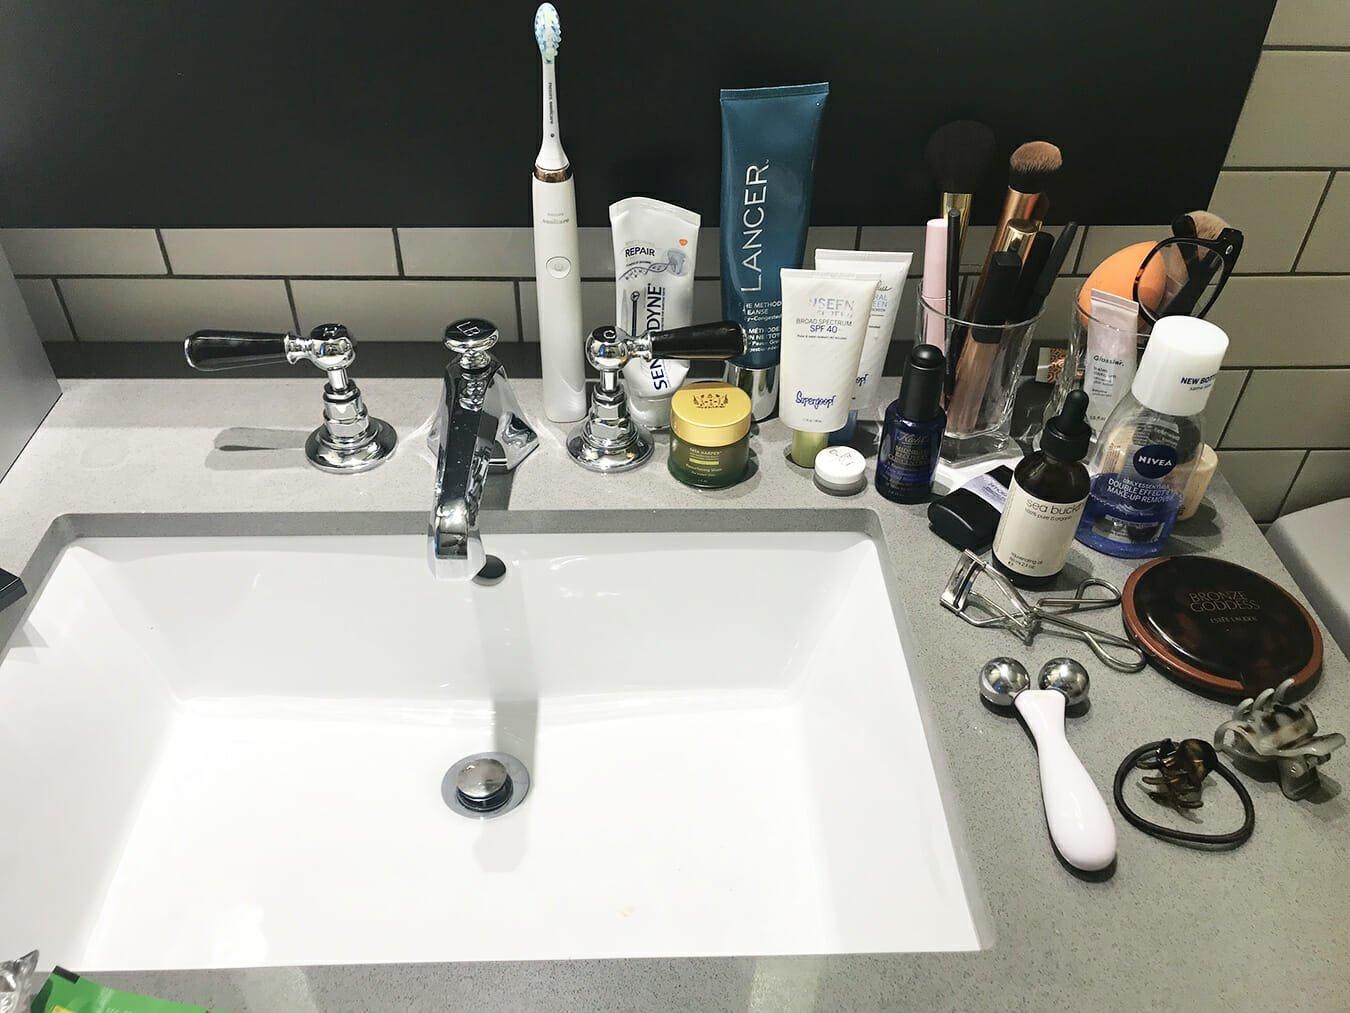 skincare sink supergoop lancer nivea tata harper estee lauder